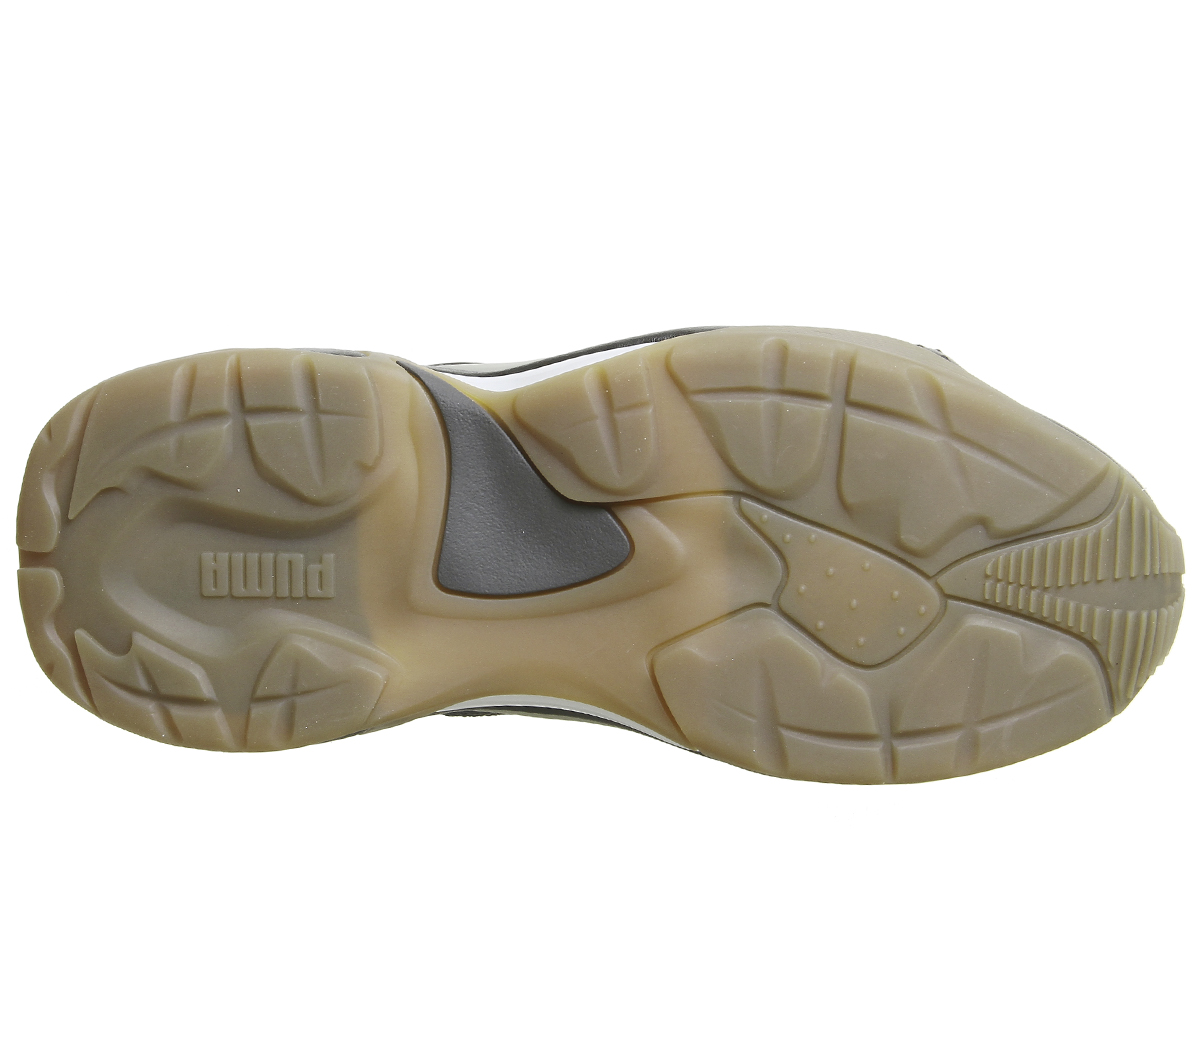 Mens-Puma-Thunder-Spectra-Trainers-Black-Grey-Purple-Gum-Trainers-Shoes thumbnail 11